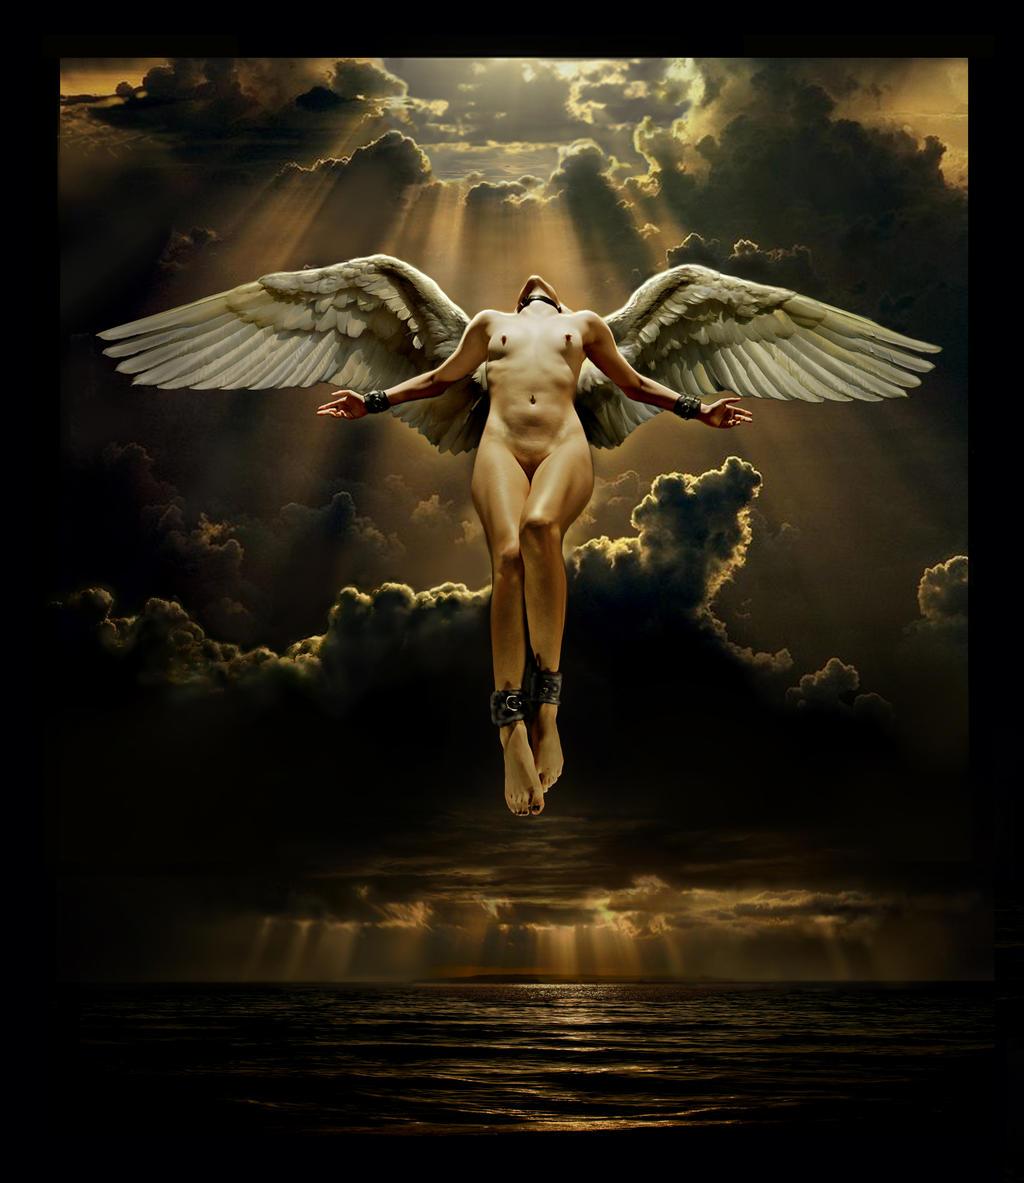 Angel Acent